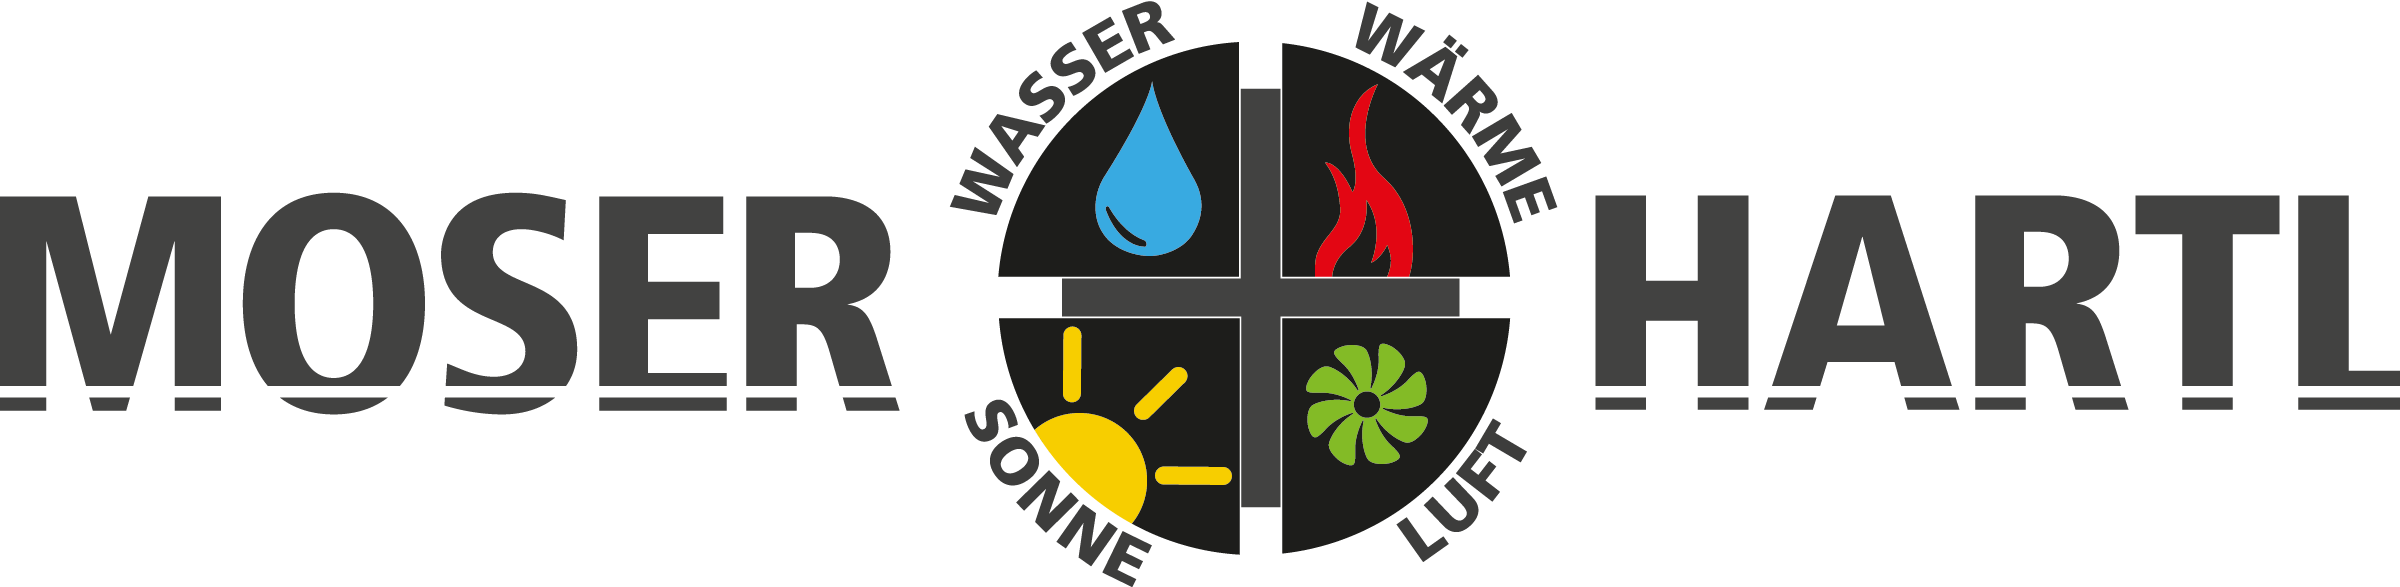 Moser & Hartl GmbH Installateur Meisterbetrieb